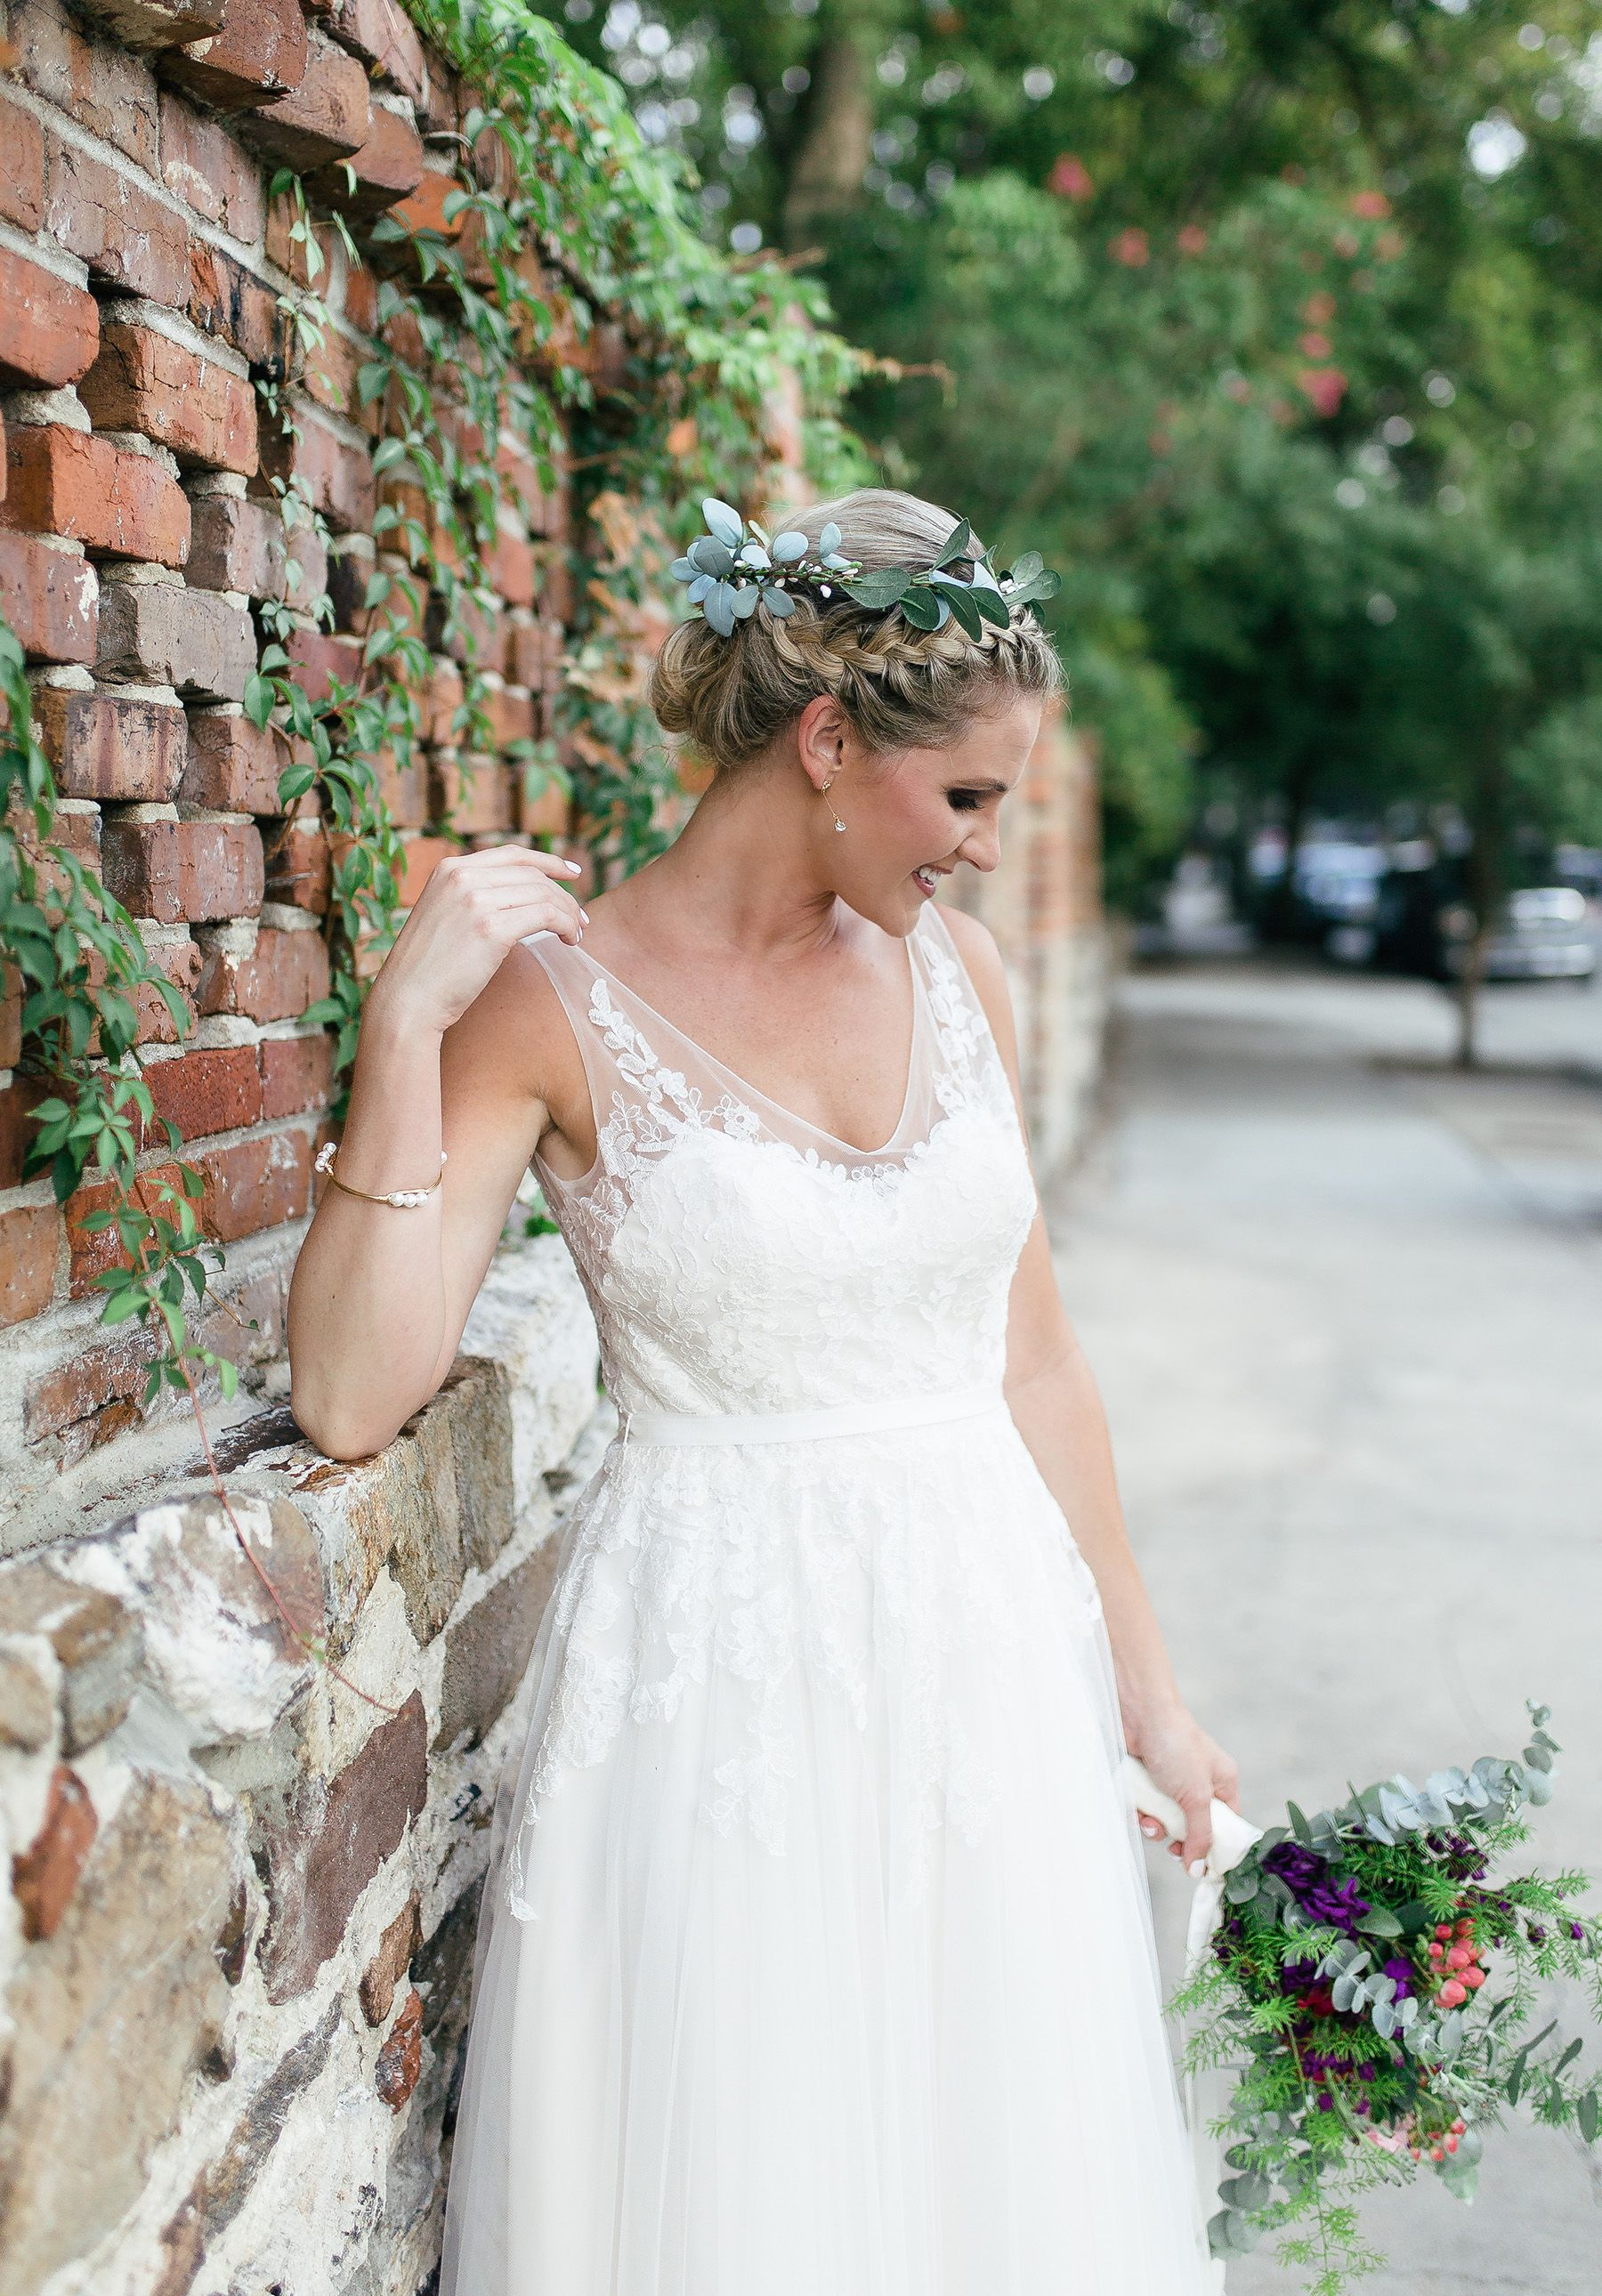 Bridal Portrait Photo Ideas Wedding Photo Ideas